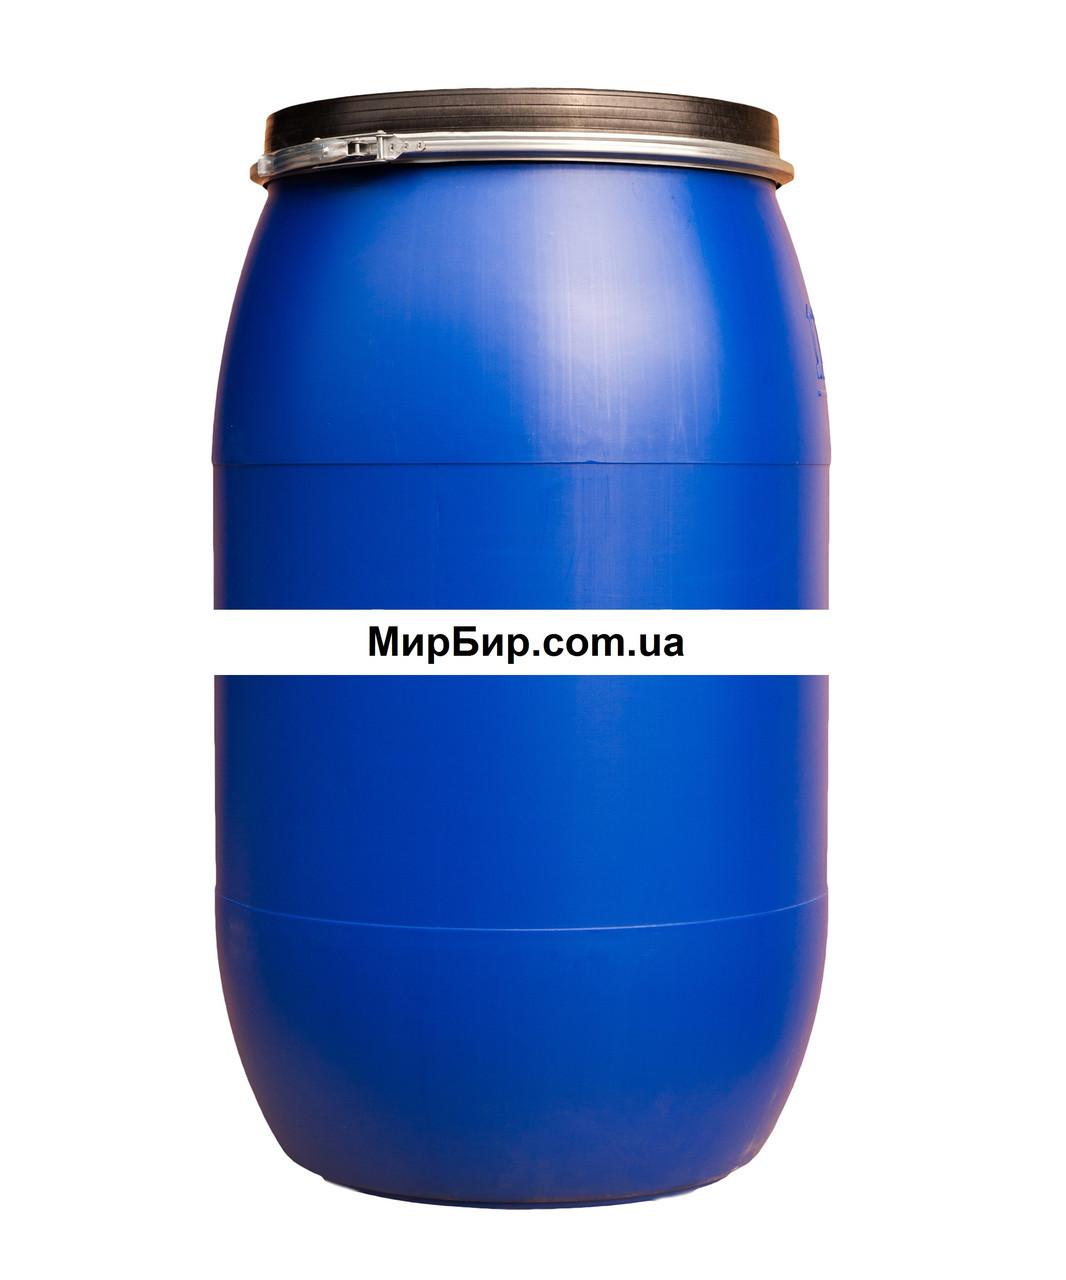 Бочка с зажимом, 180 литров